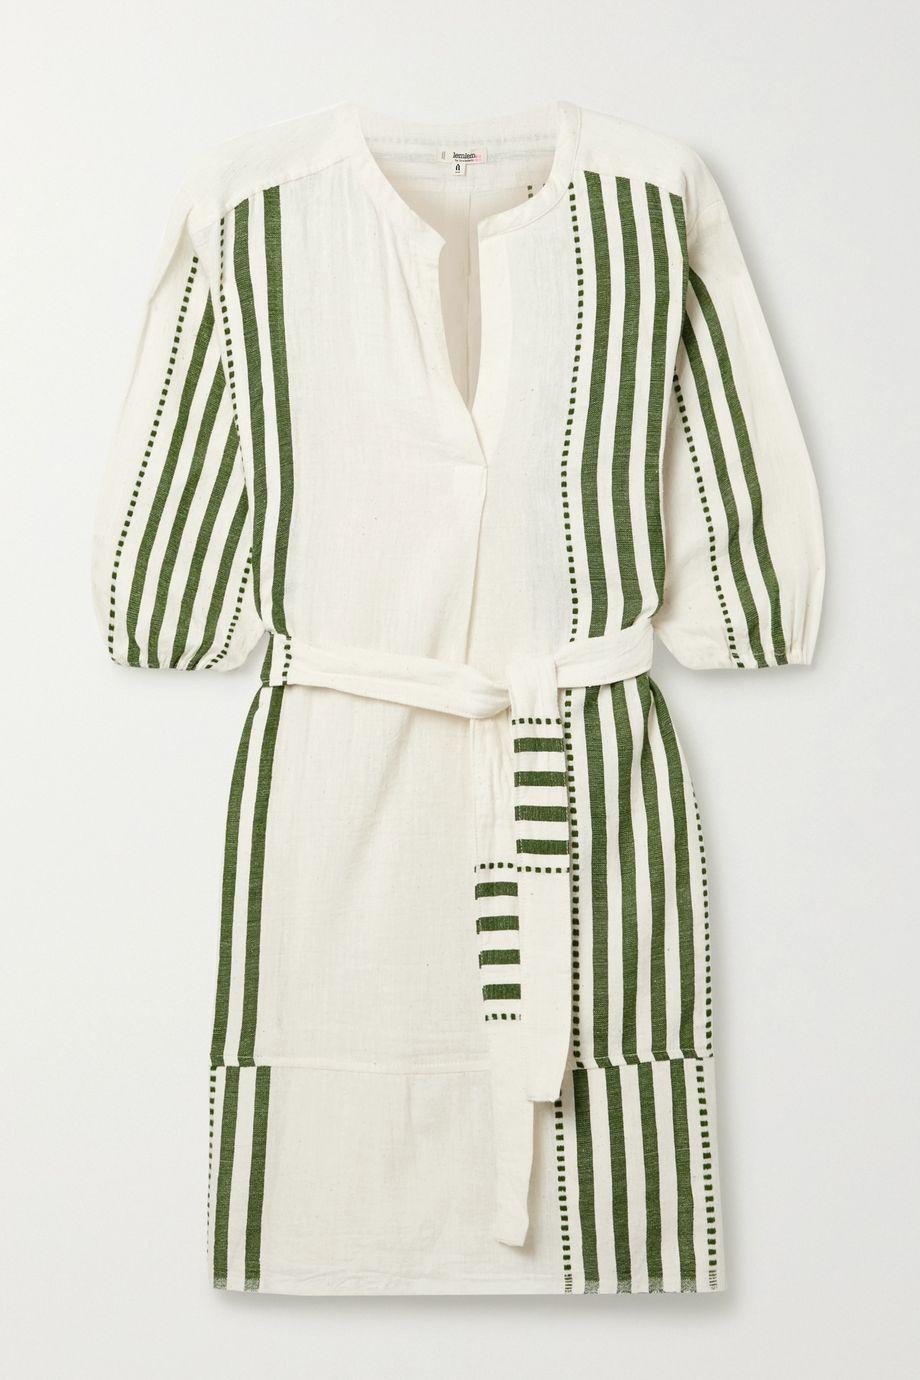 LemLem Eshe Minikleid aus gestreifter Baumwollgaze mit Bindegürtel